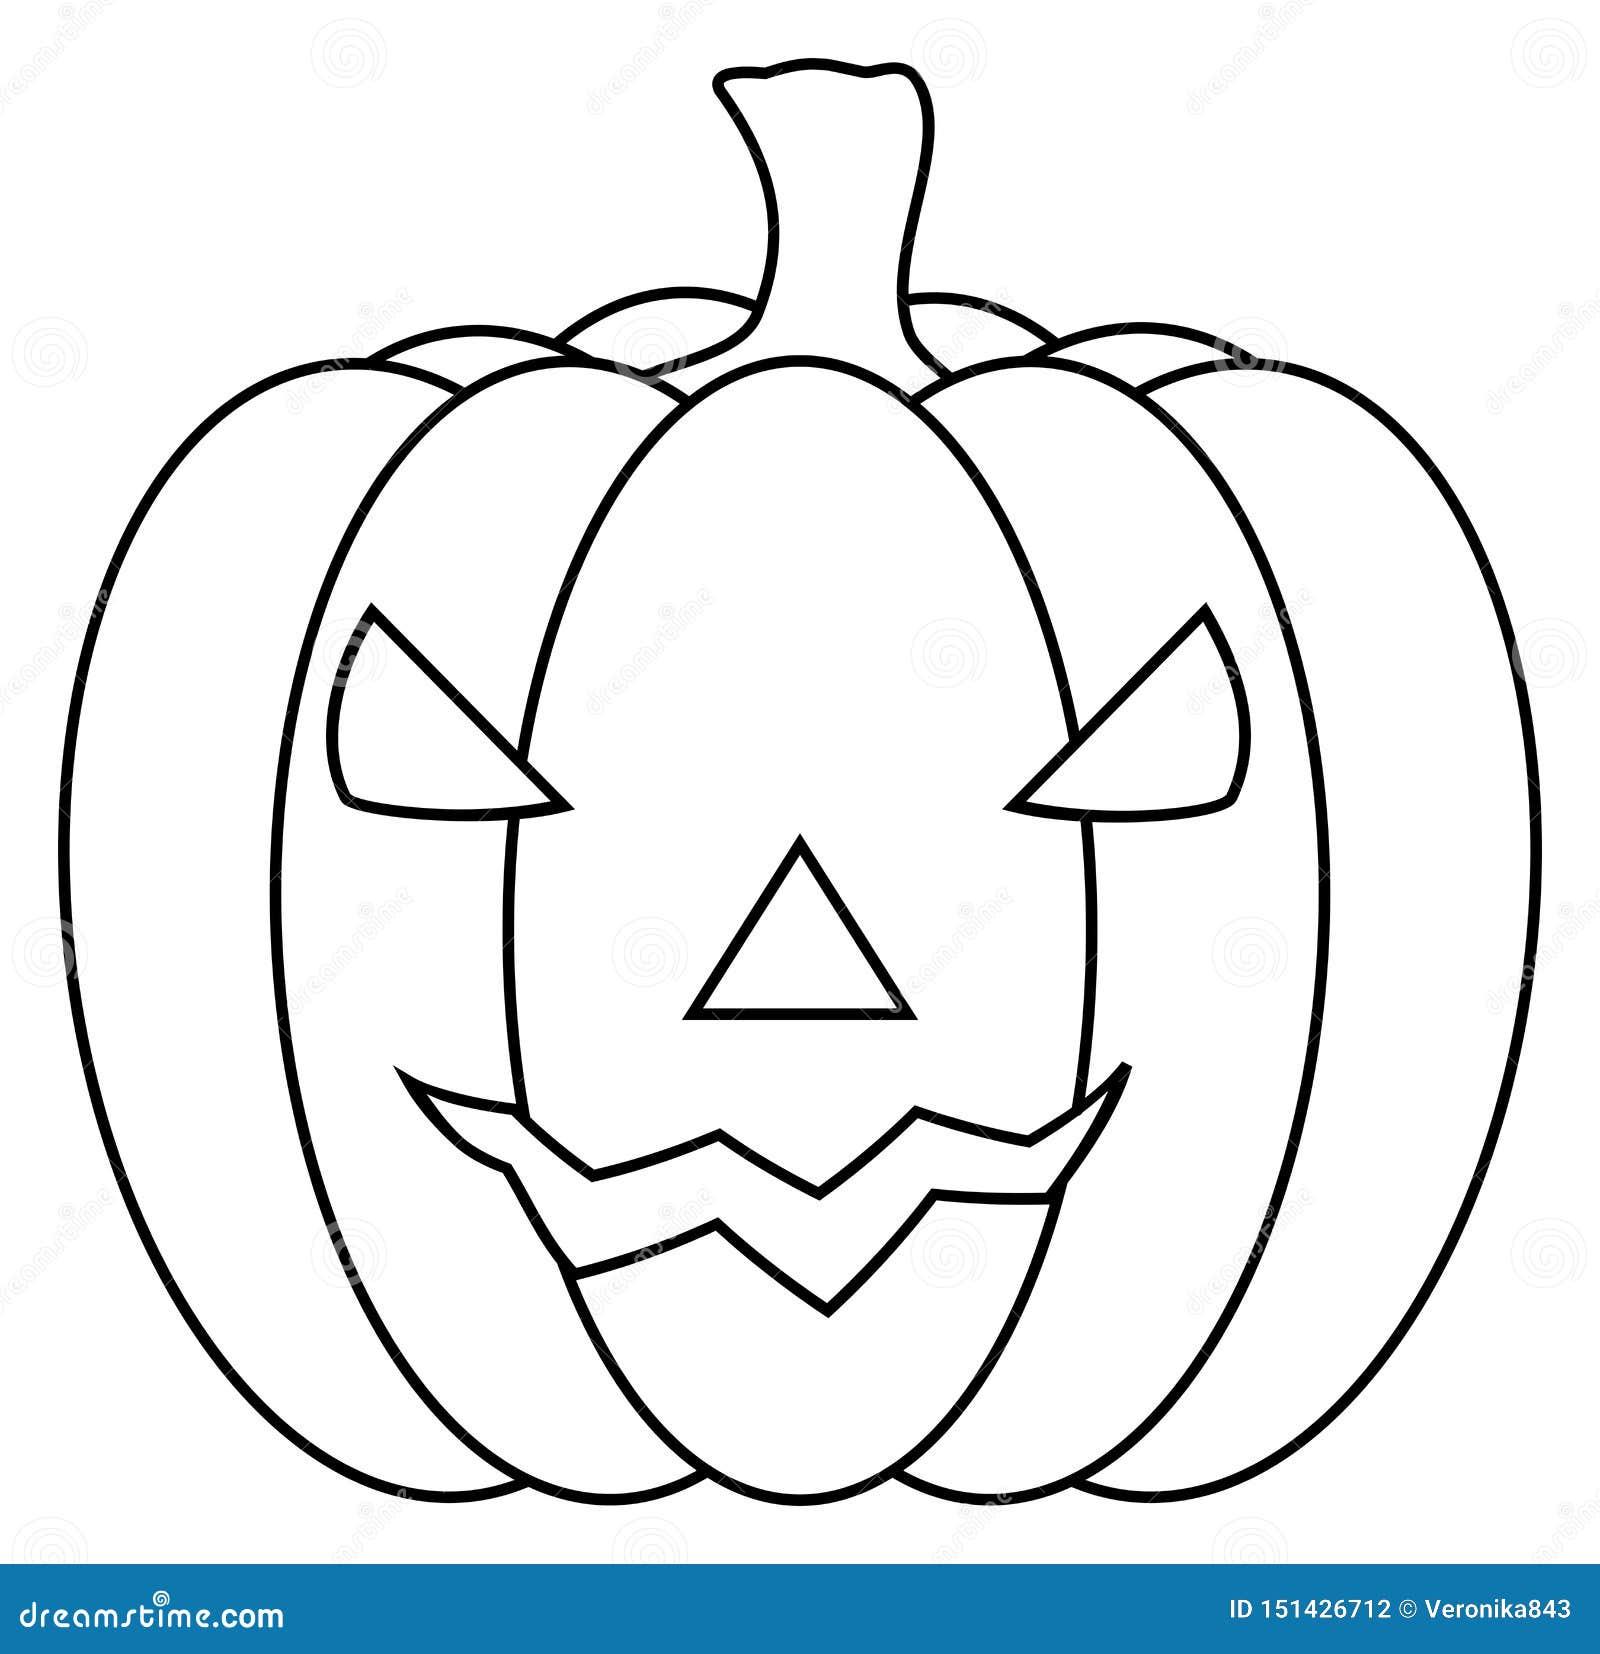 Halloween Carved Pumpkin Clipart Jack O Lantern Icon Vector Illustration Stock Vector Illustration Of Line Natural 151426712